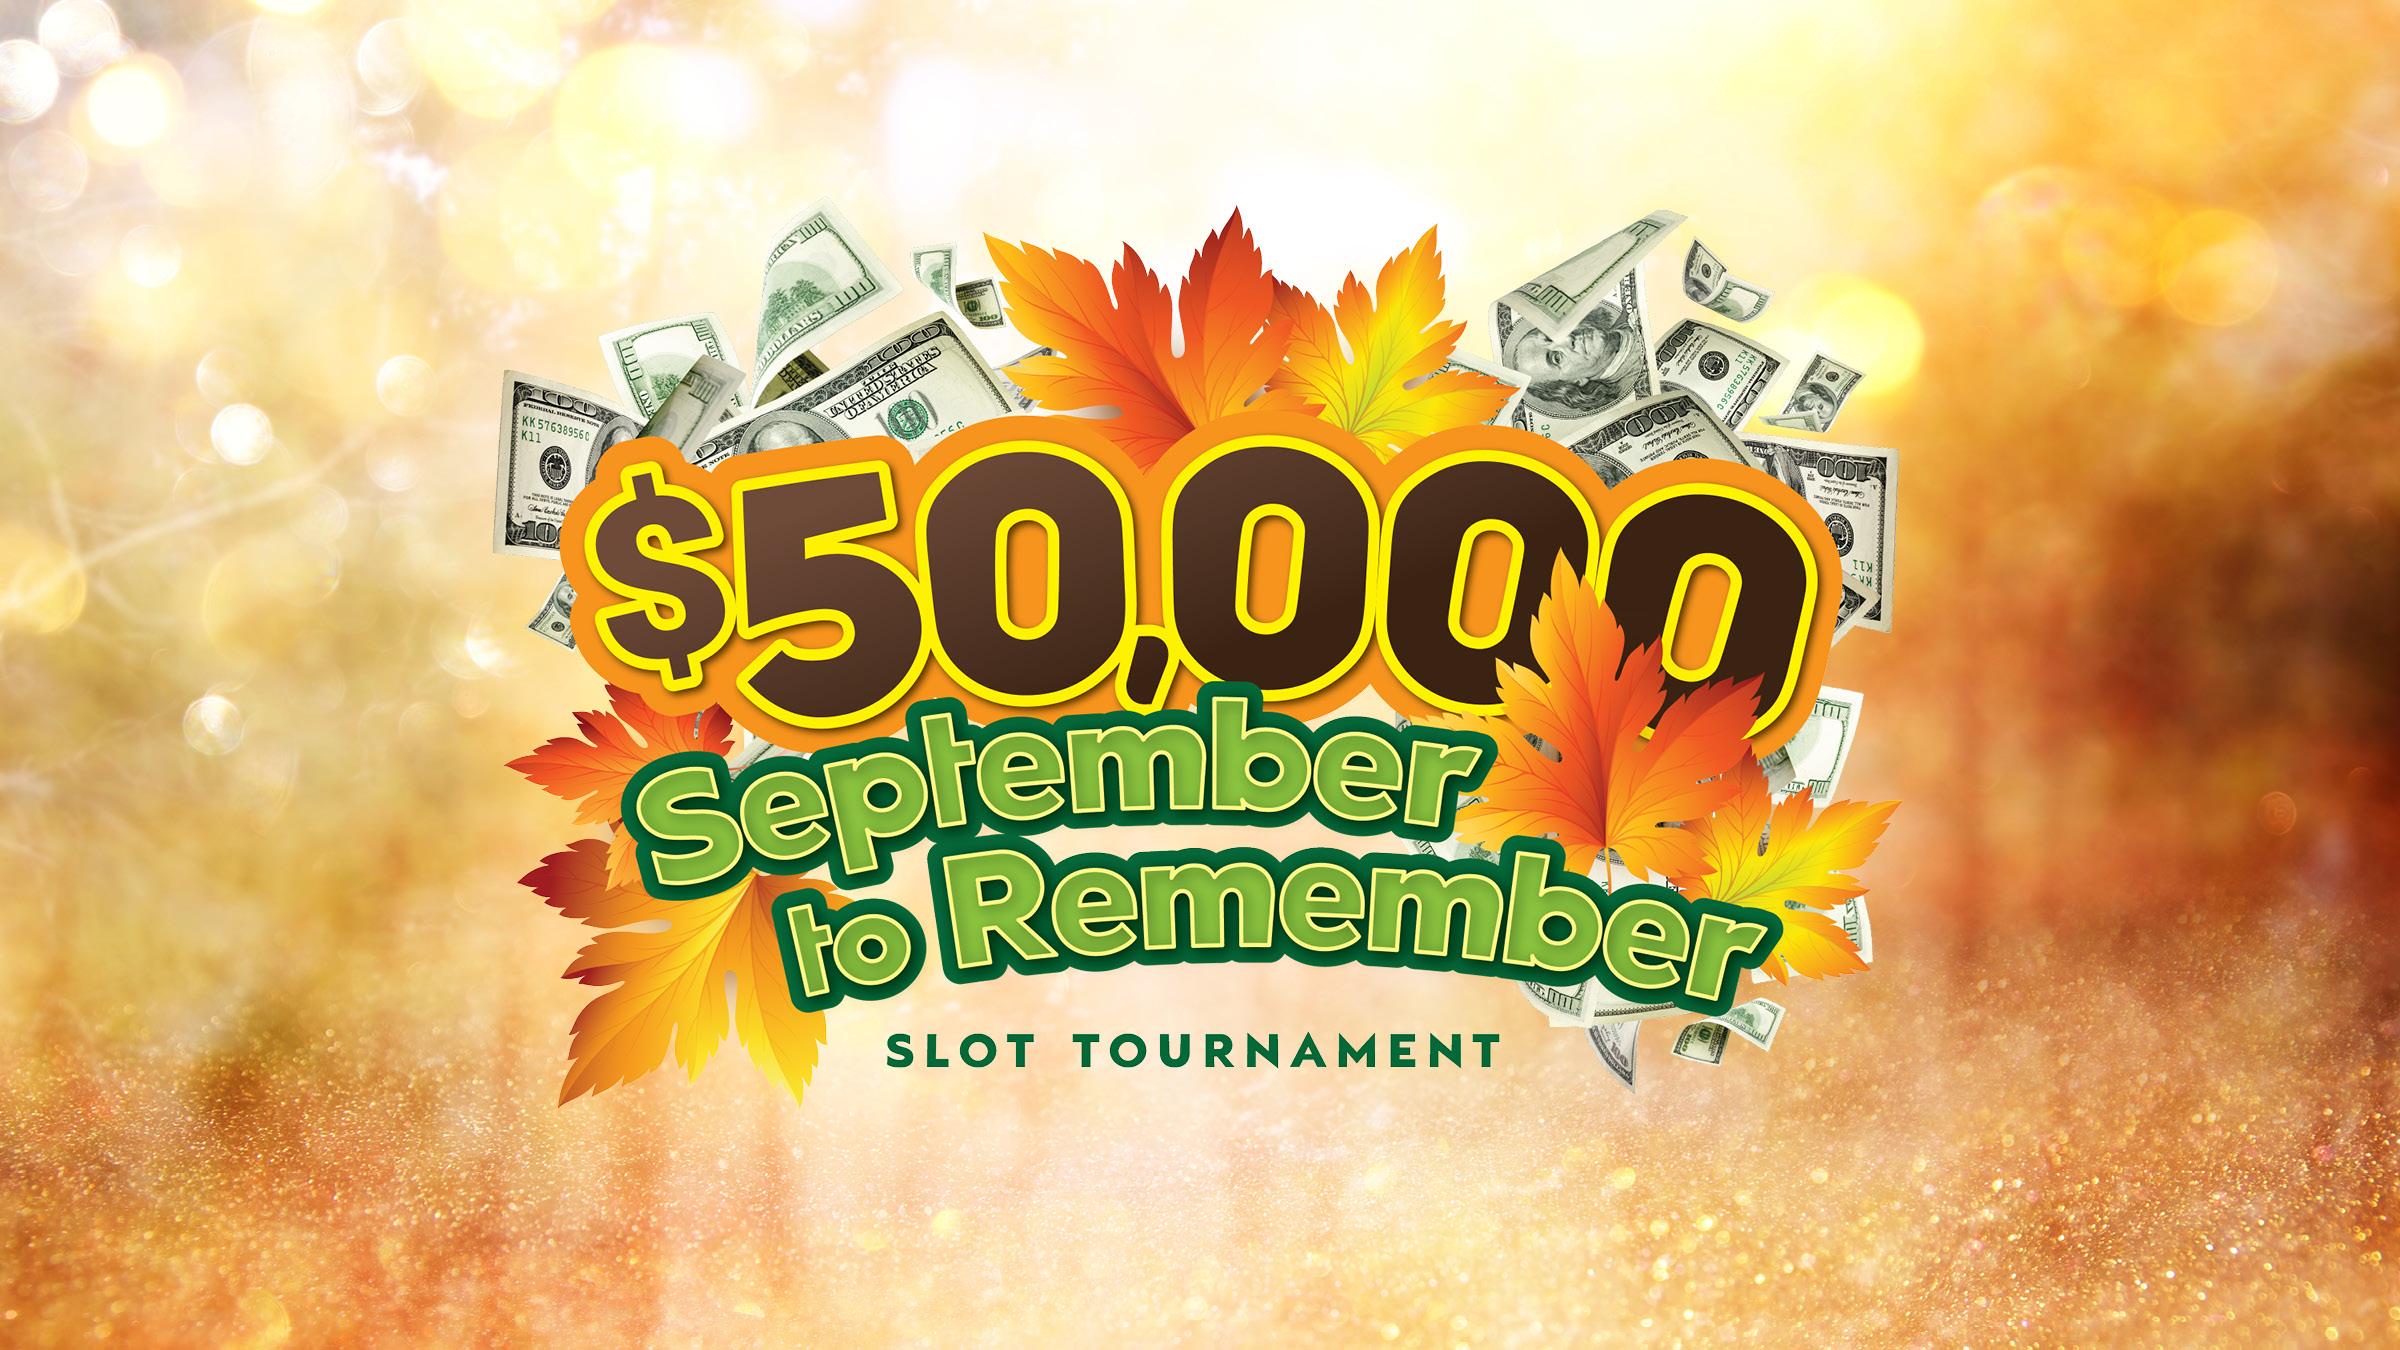 $50,000 September to Remember Slot Tournament